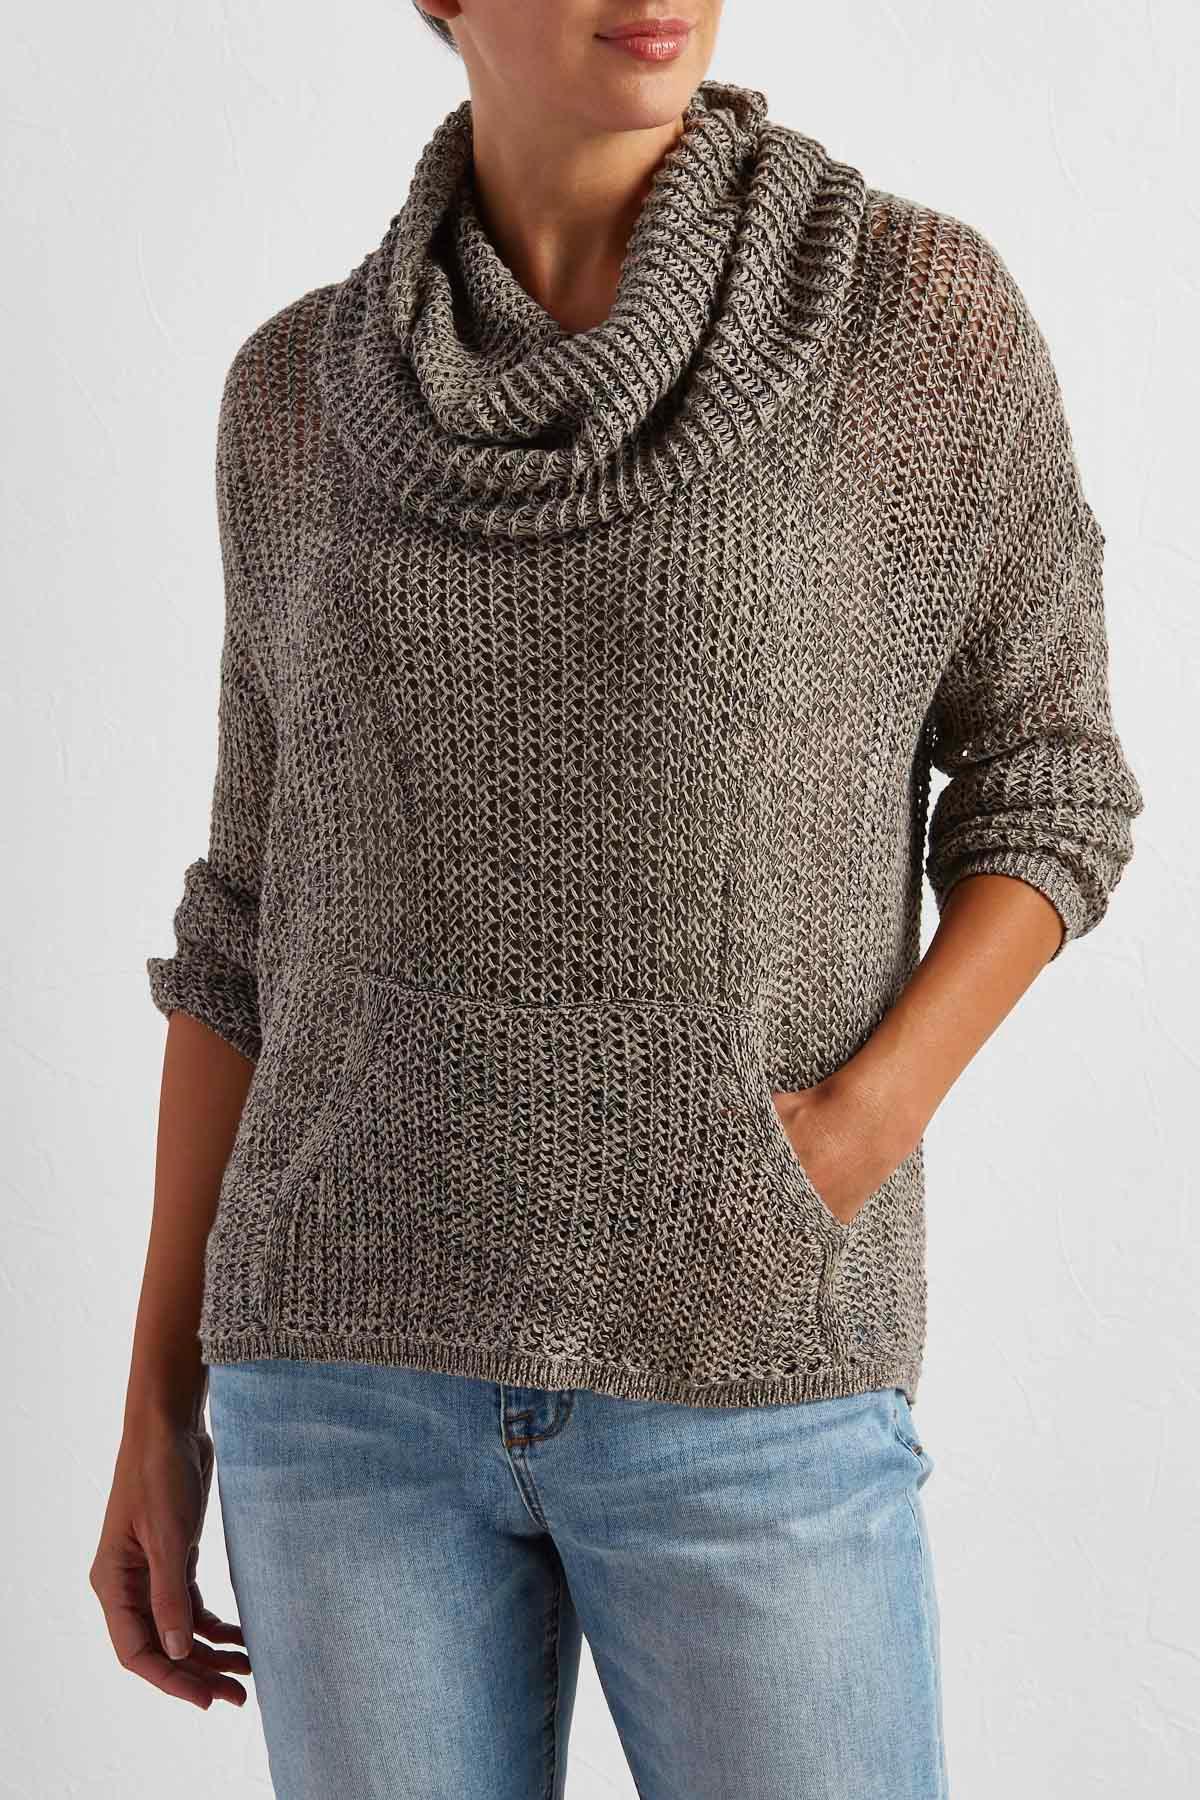 Fishnet Cowl Neck Sweater